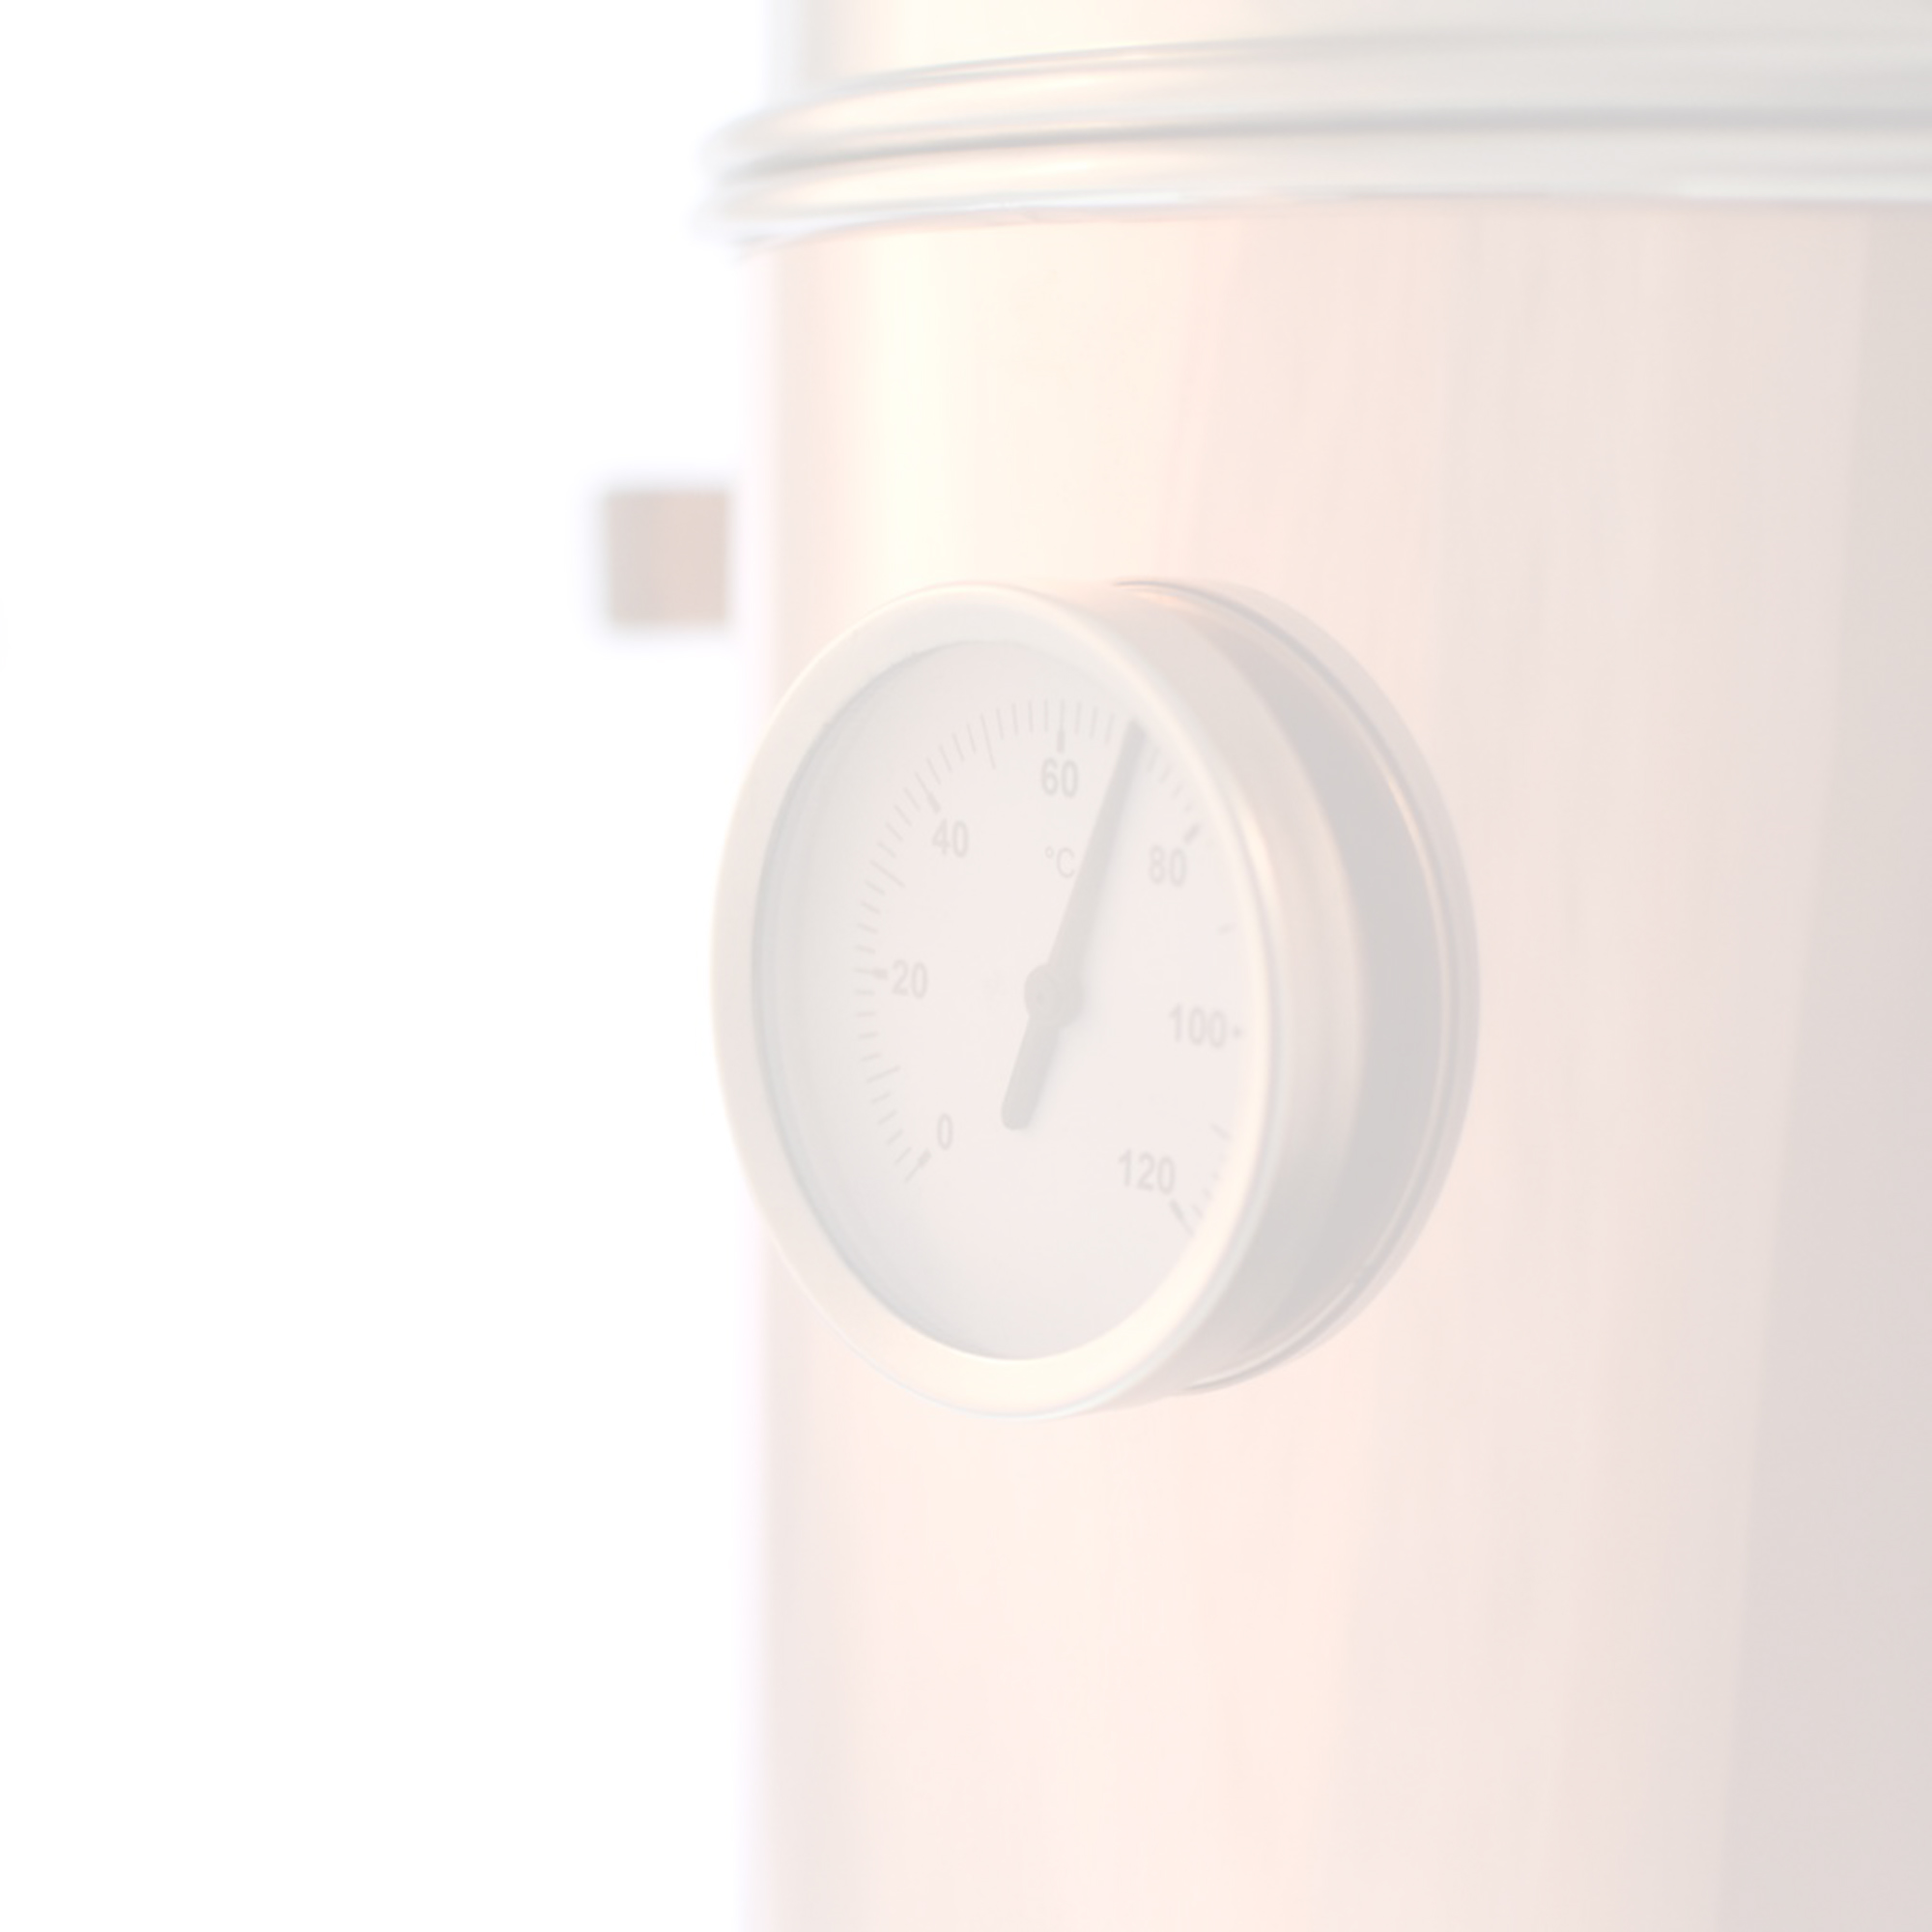 Glühweintopf Thermometer